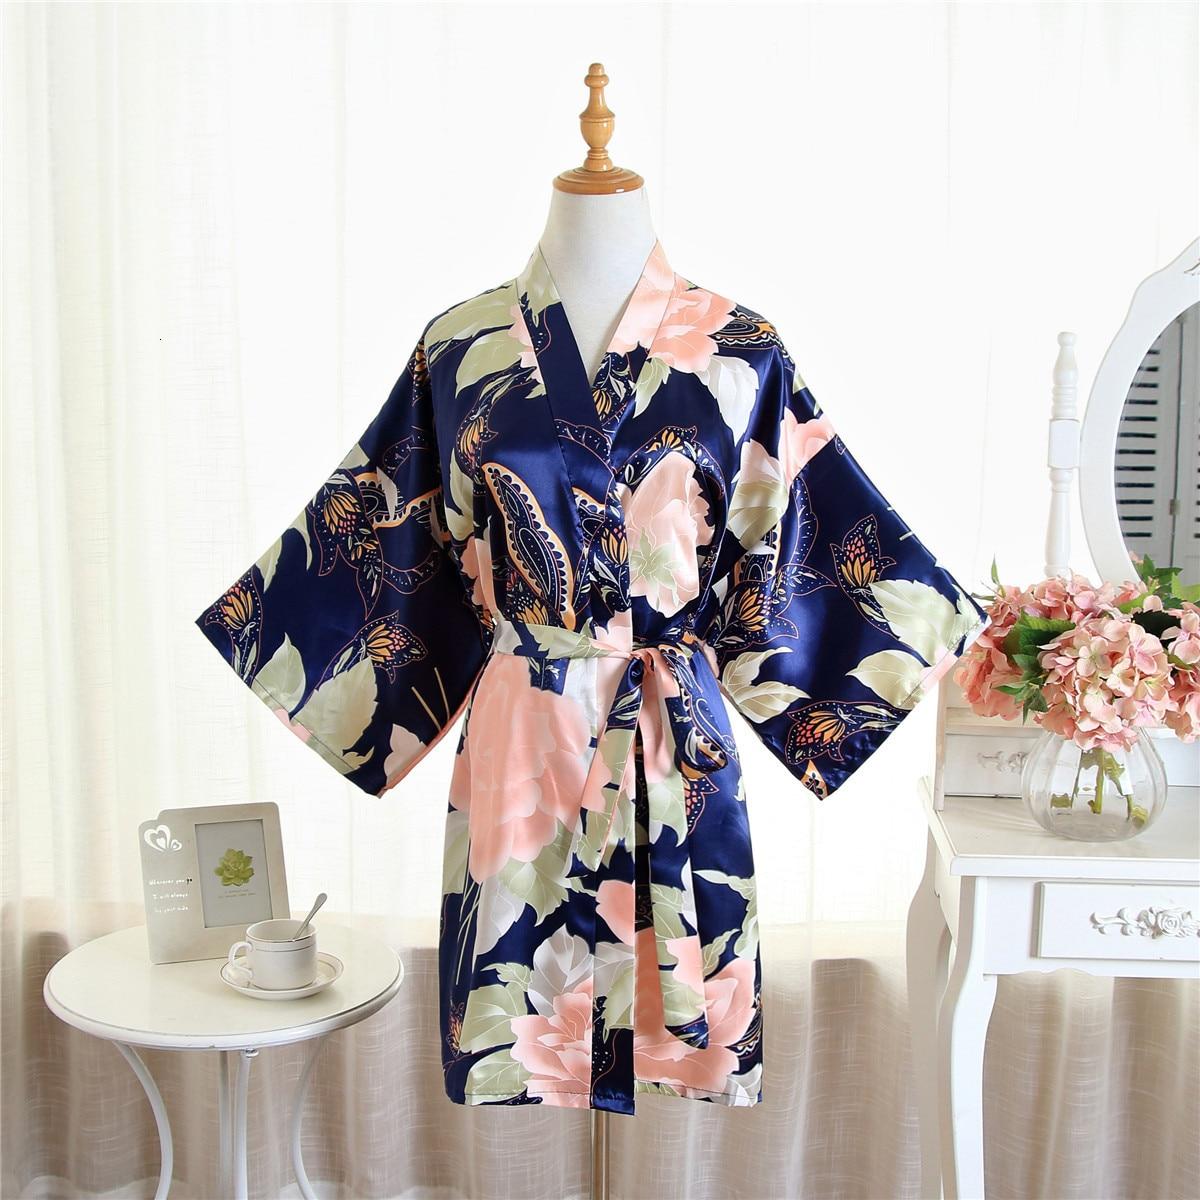 New Big Peony Flower Silk Wedding Dress Bridesmaid Bride Kimono Cardigan Dress Thin Women Summer Sleepwear Bathrobe Yukata New